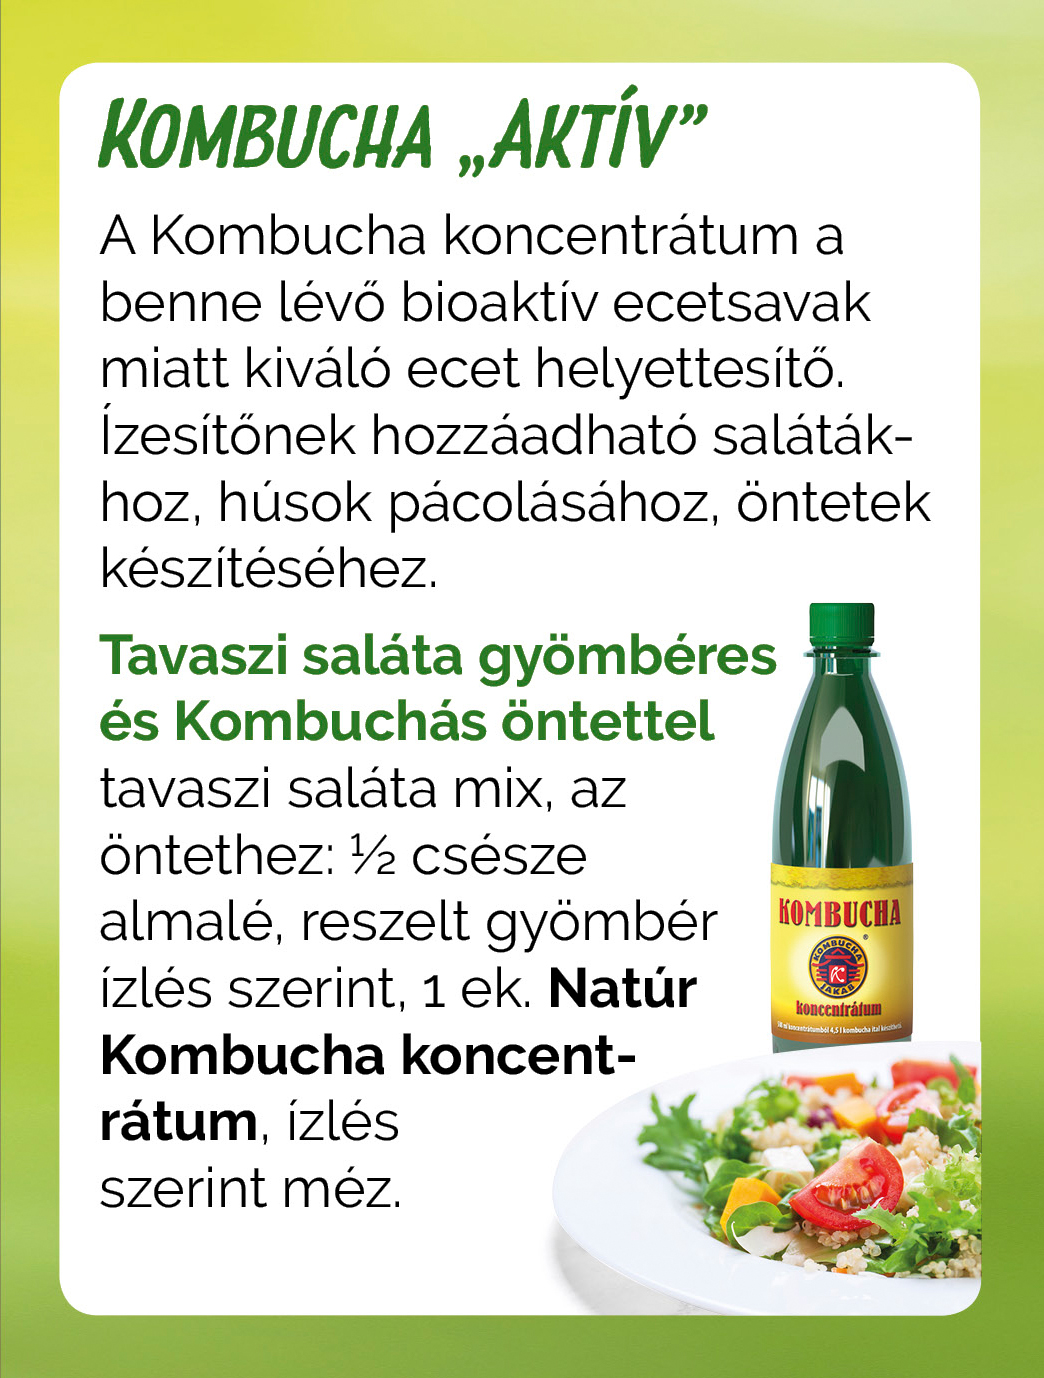 Kombucha aktiv salatale recept